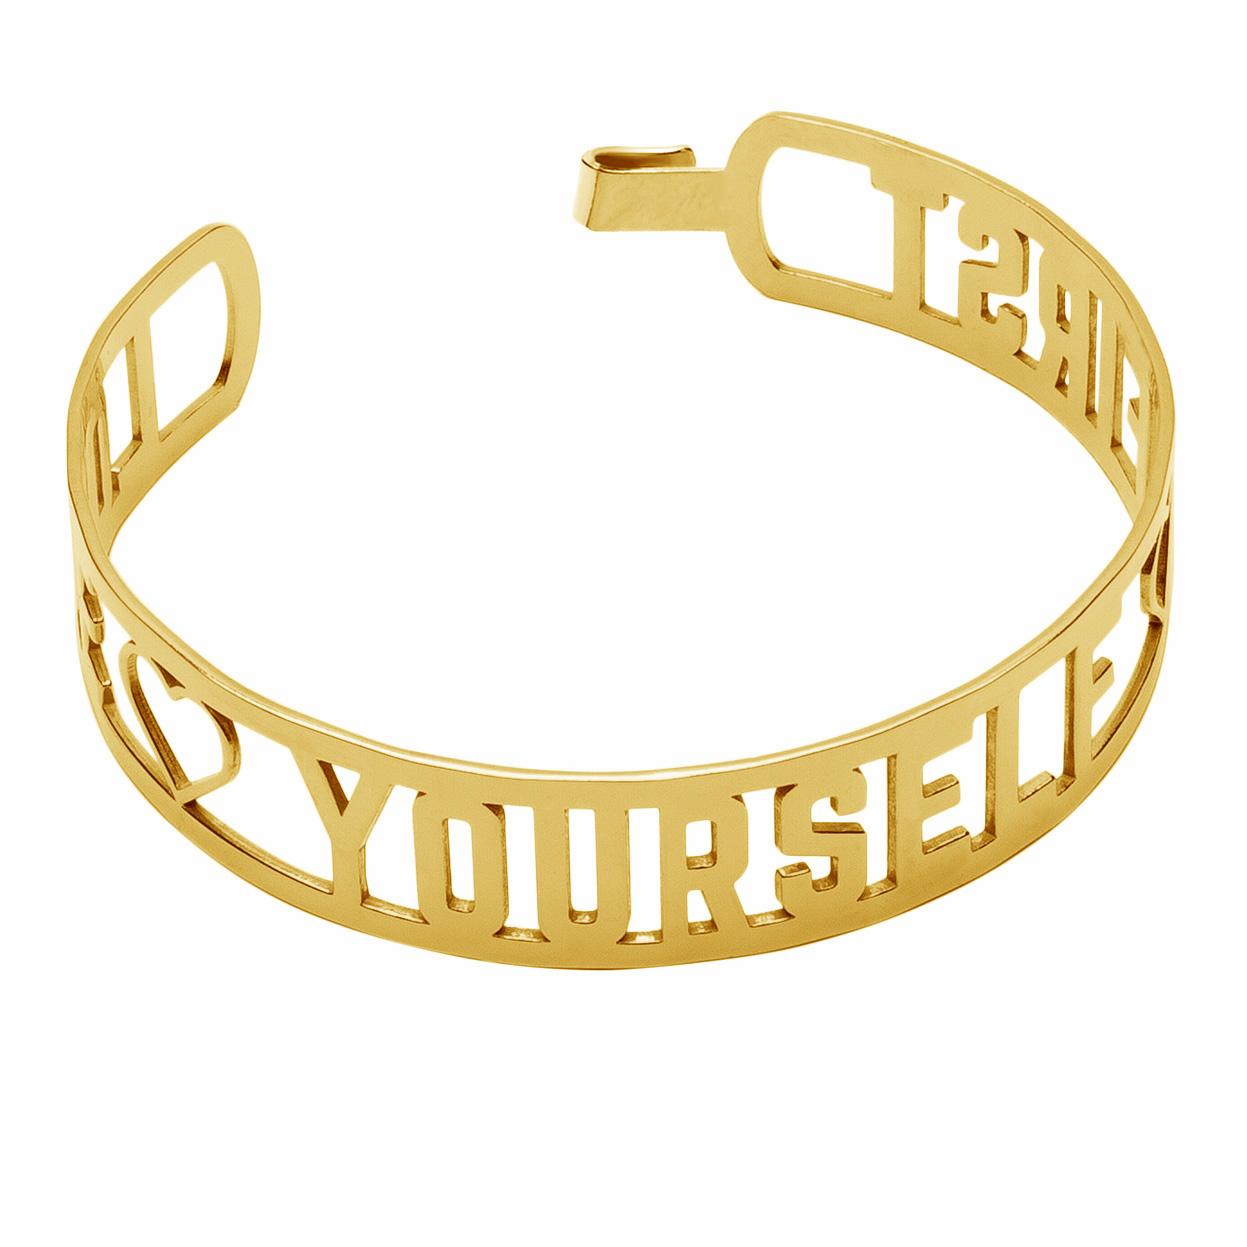 LOVE YOURSELF FIRST BANGLE BRACELET GOLD 585 14K